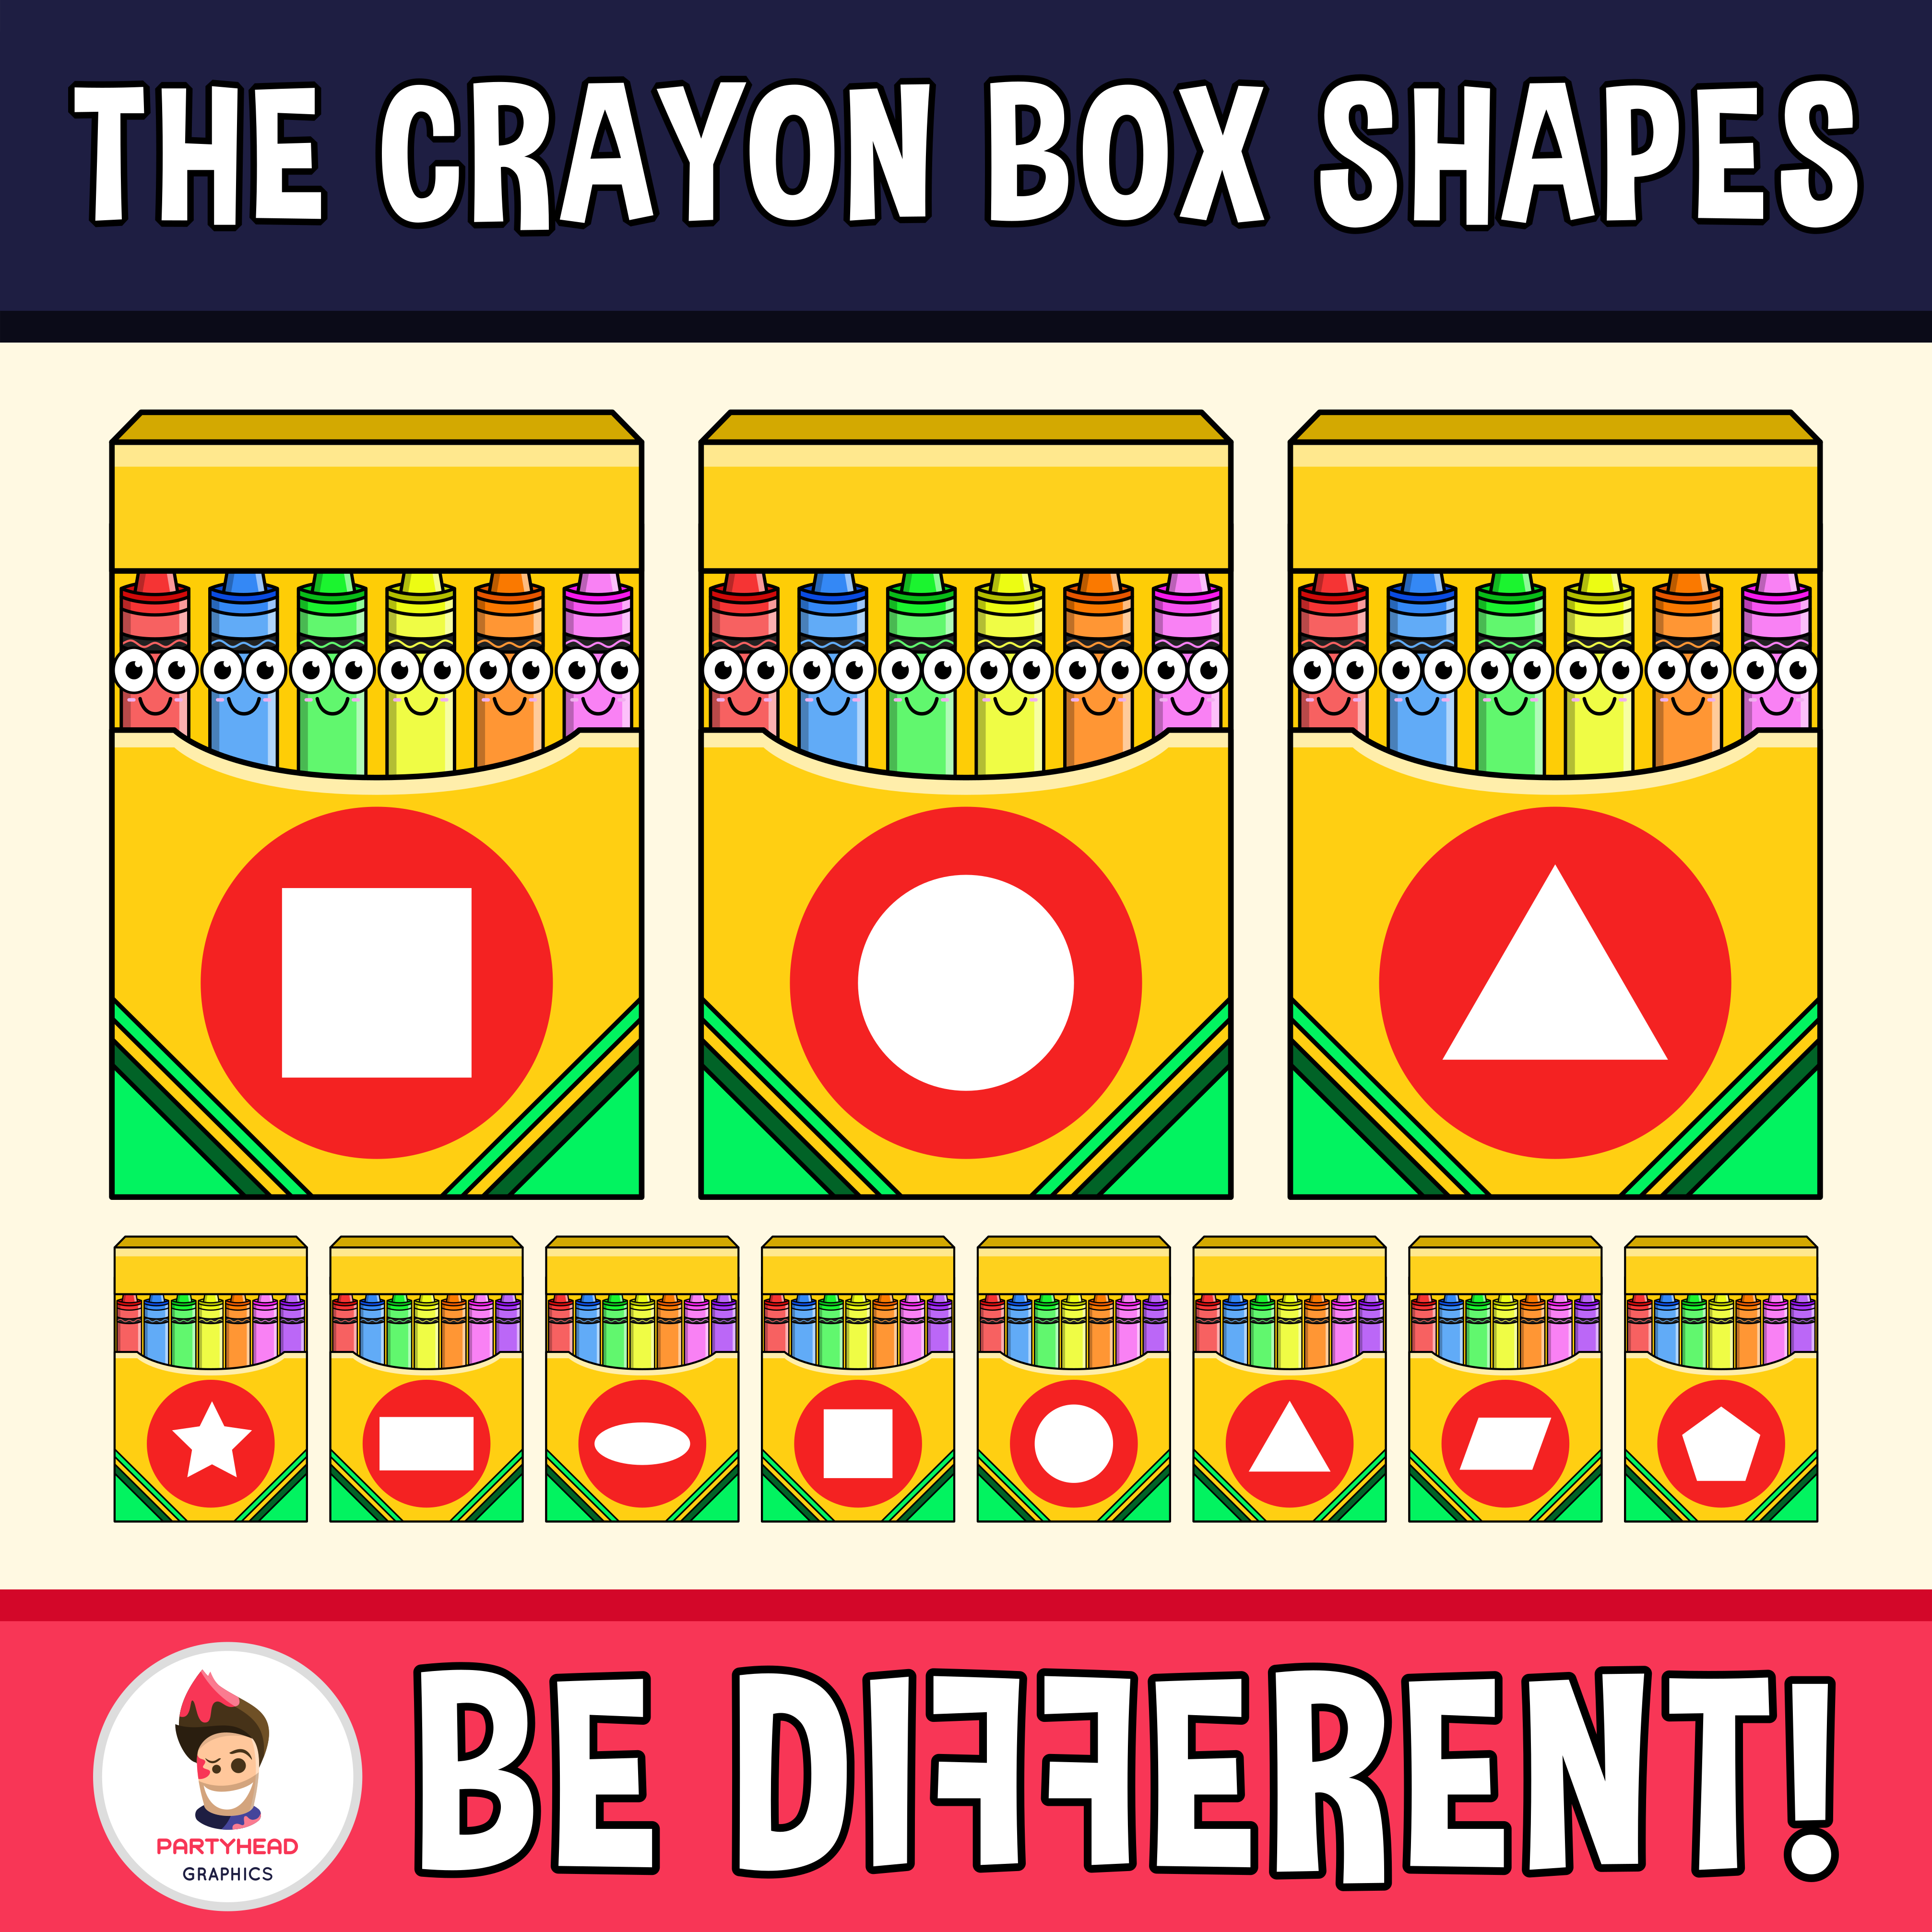 Crayon clipart shape. Box shapes